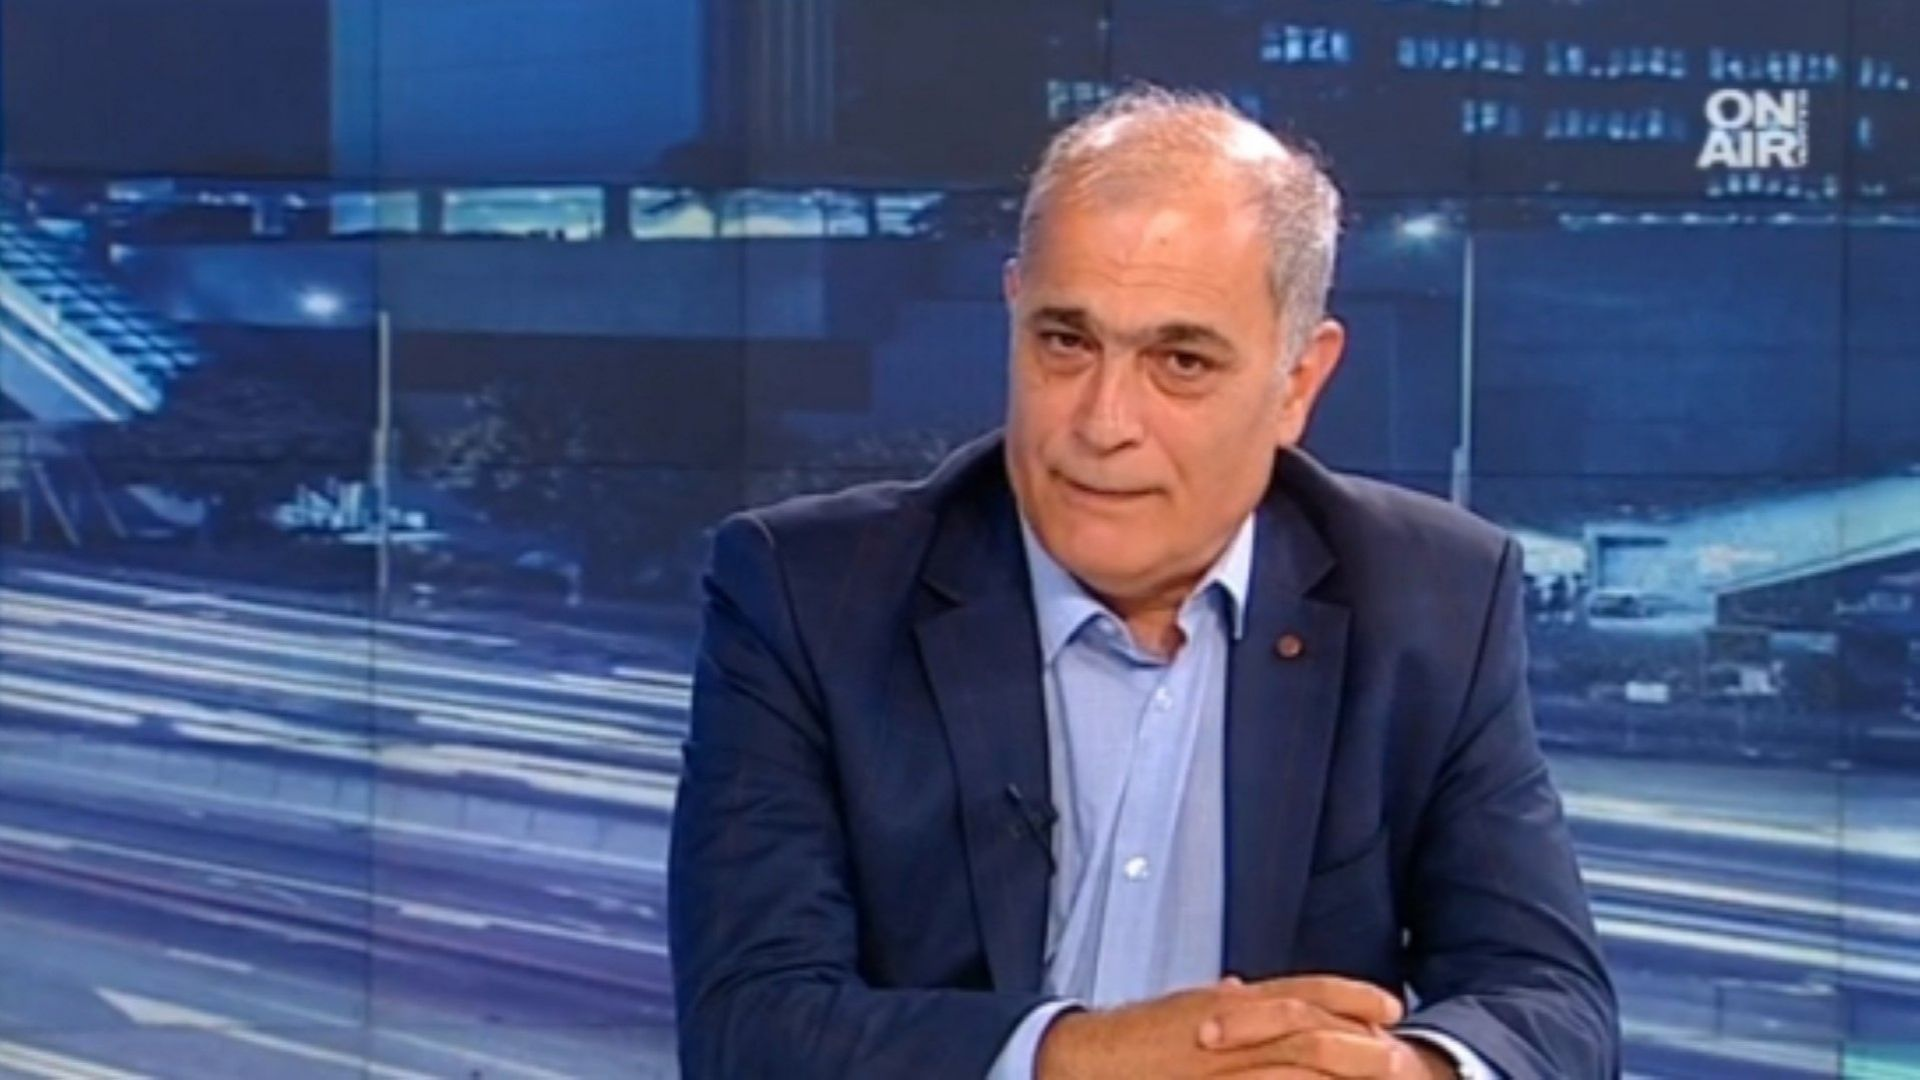 Симеон Василев: Европа направи грешка с допускането на мигрантските потоци